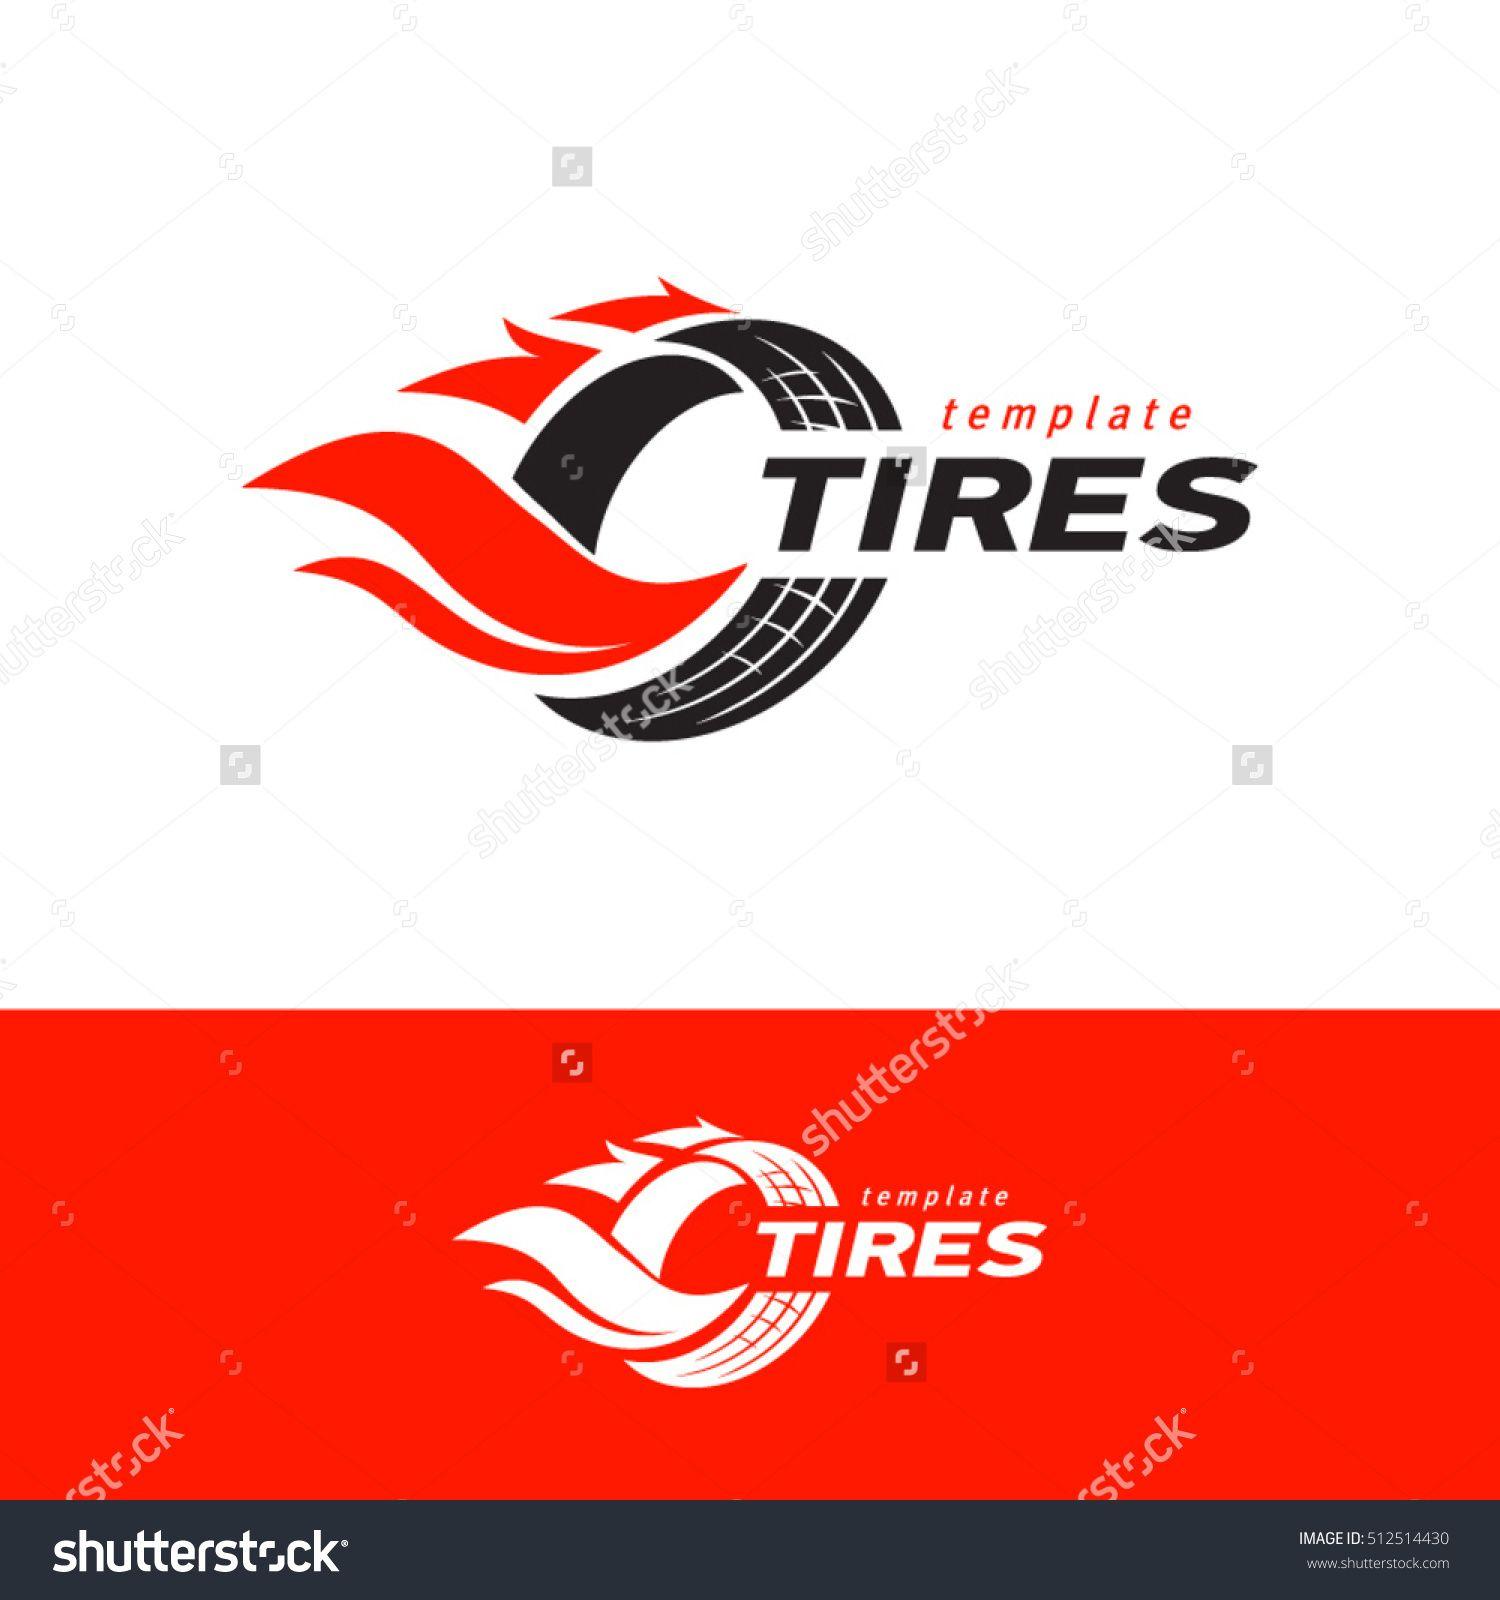 Tires Logo Design Template Silhouette Wheel Vector Red Color